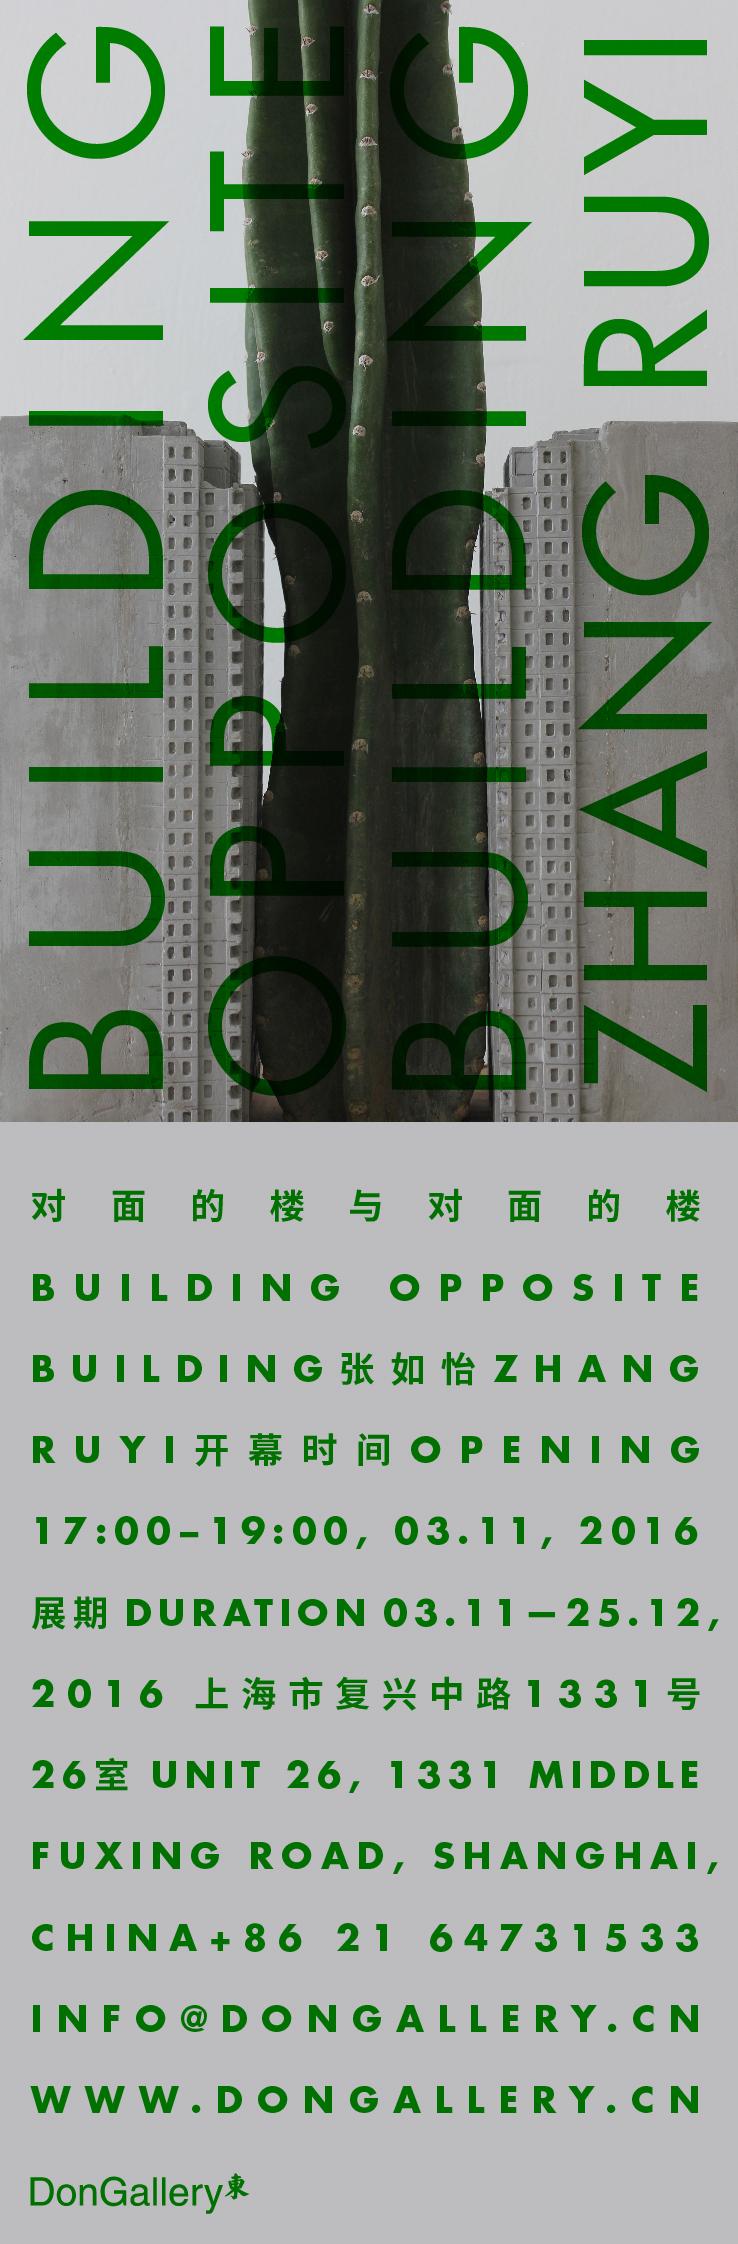 Building-Opposite-Building.JPG#asset:245